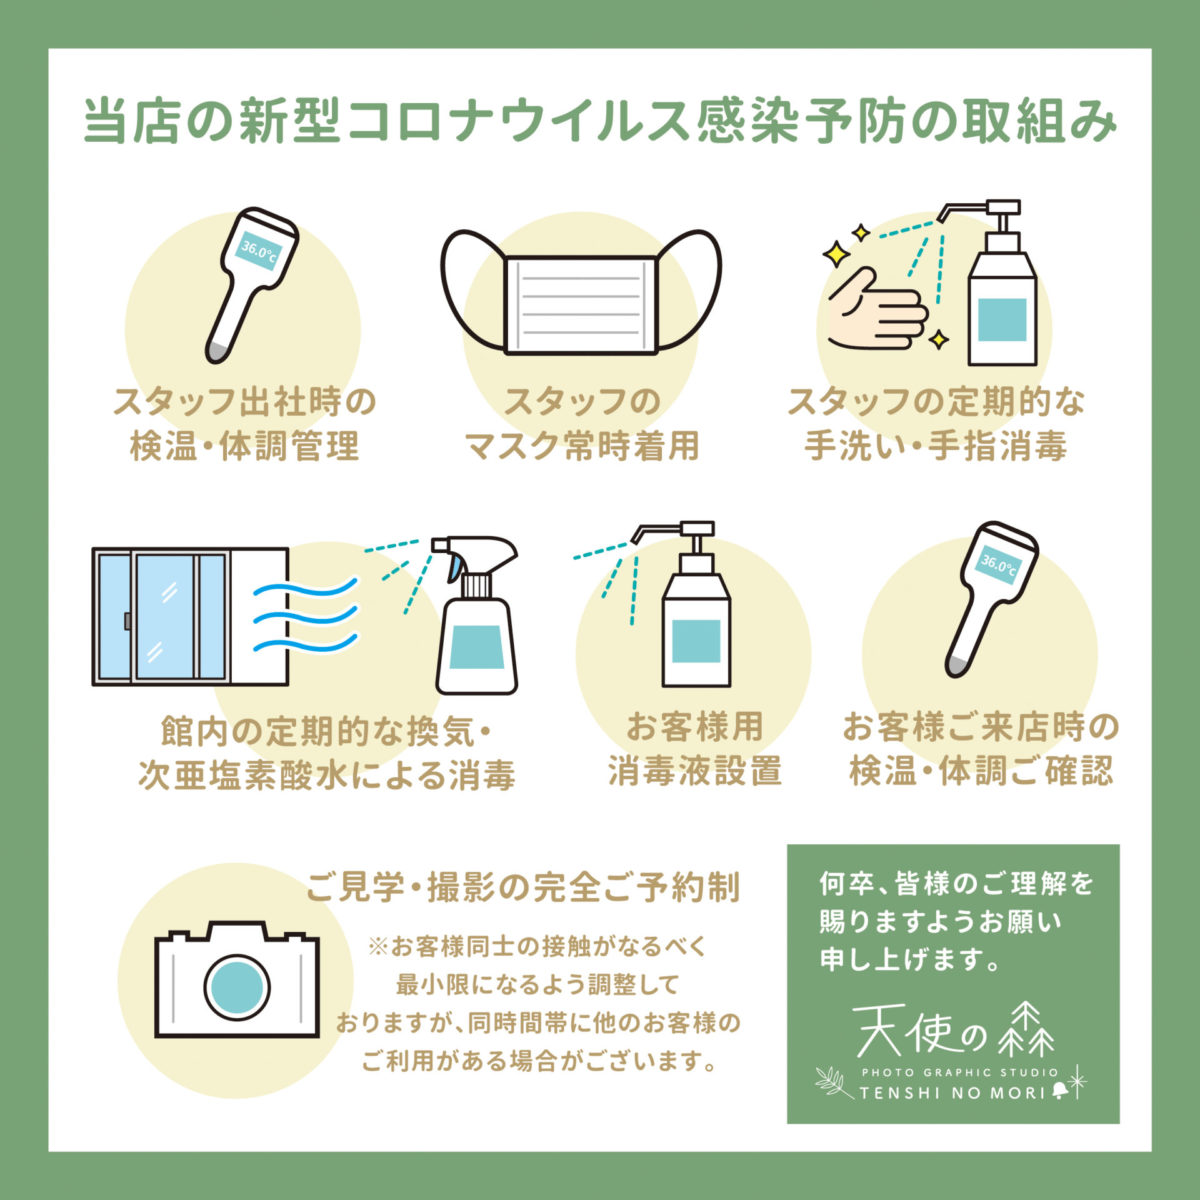 新型 状況 感染 栃木 県 コロナ